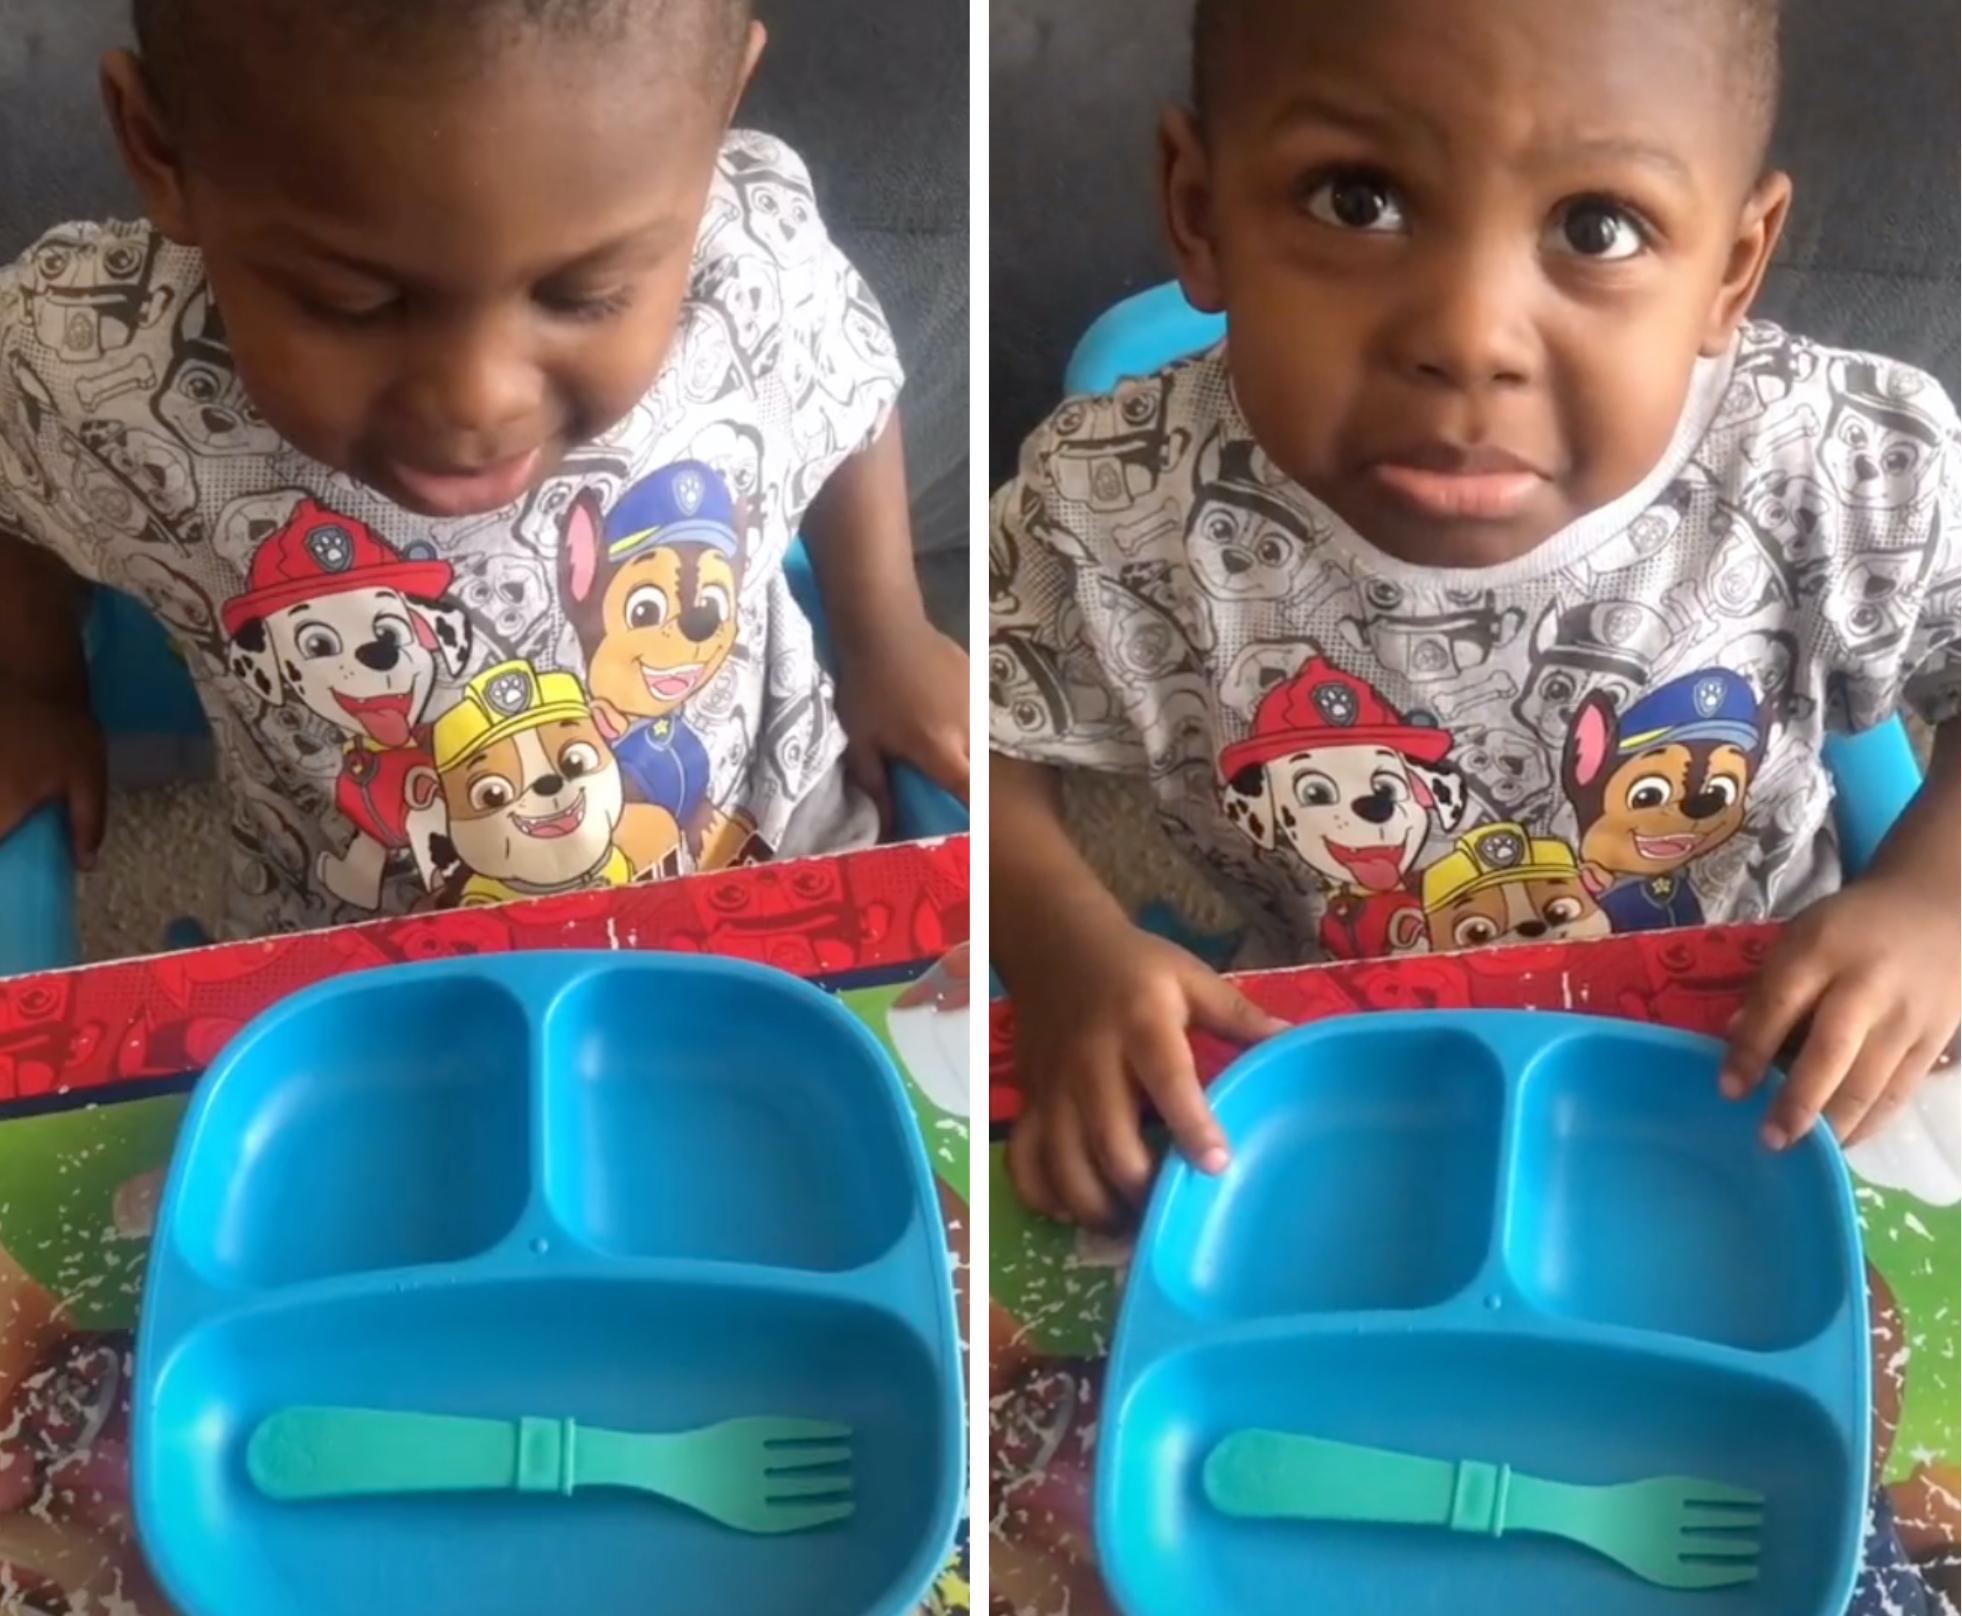 Mom brought to tears by toddler's reaction to TikTok prank